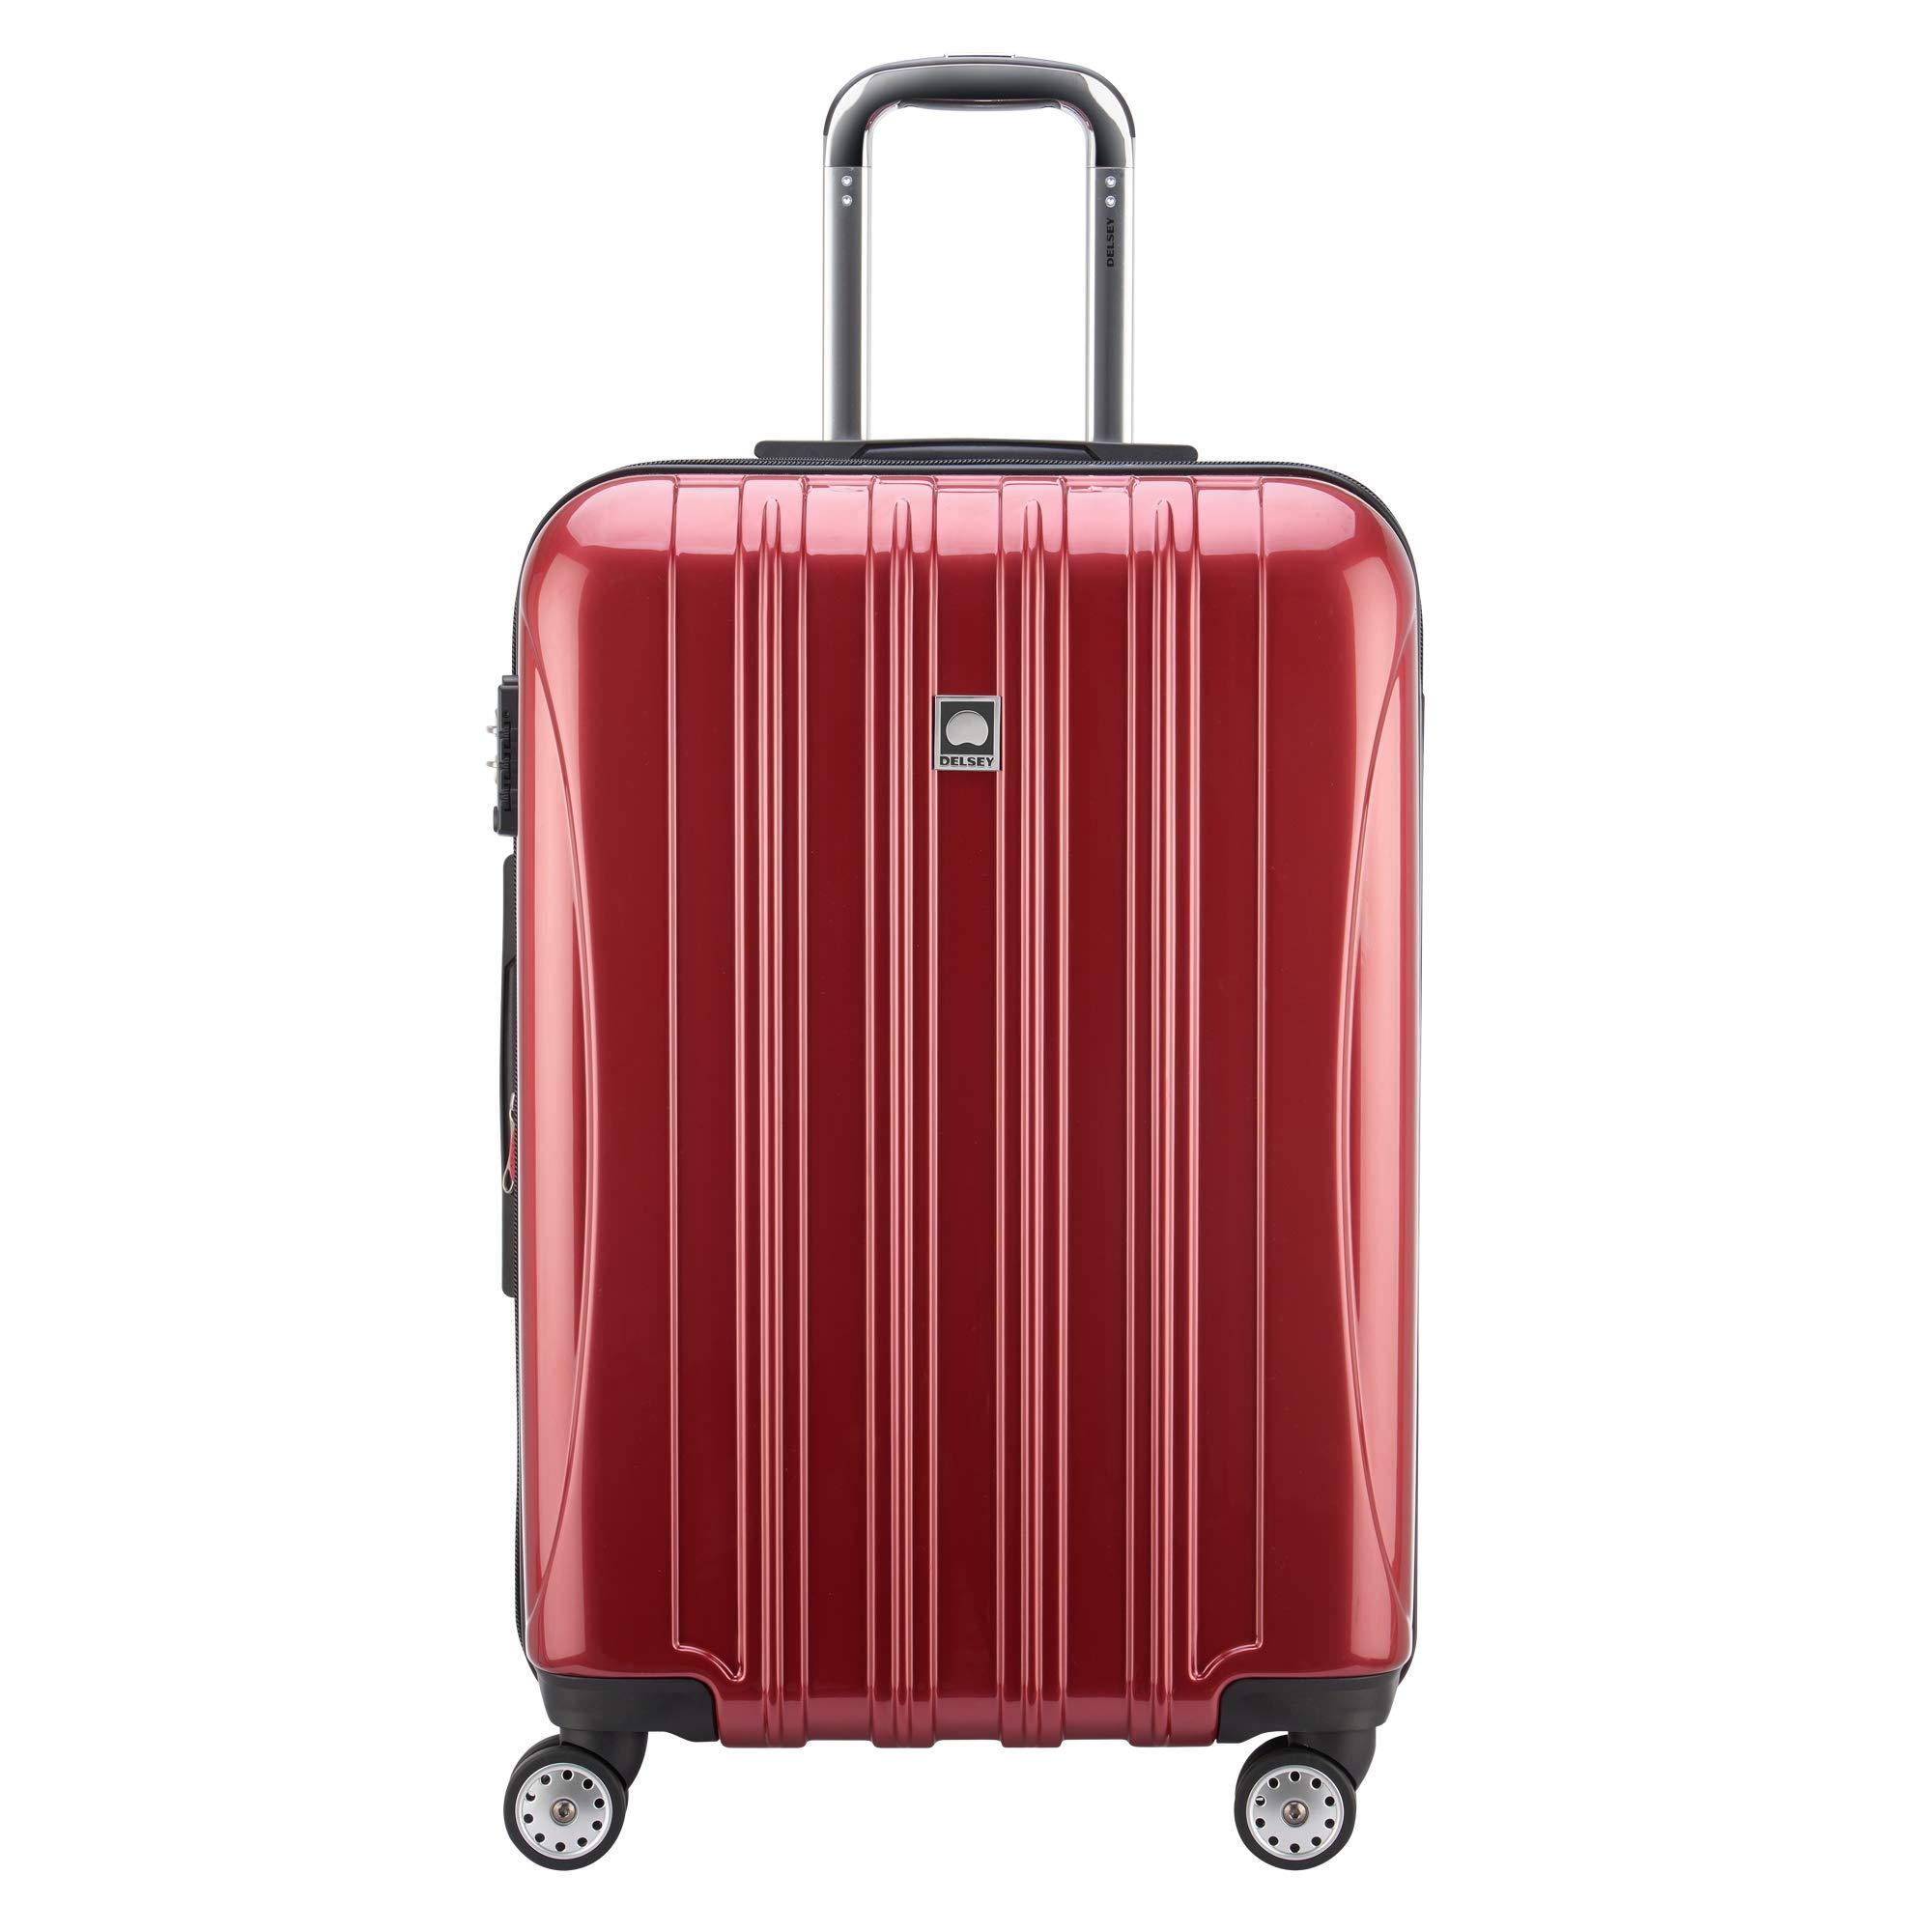 DELSEY Paris Luggage Checked-Medium (25''-28''), Brick Red